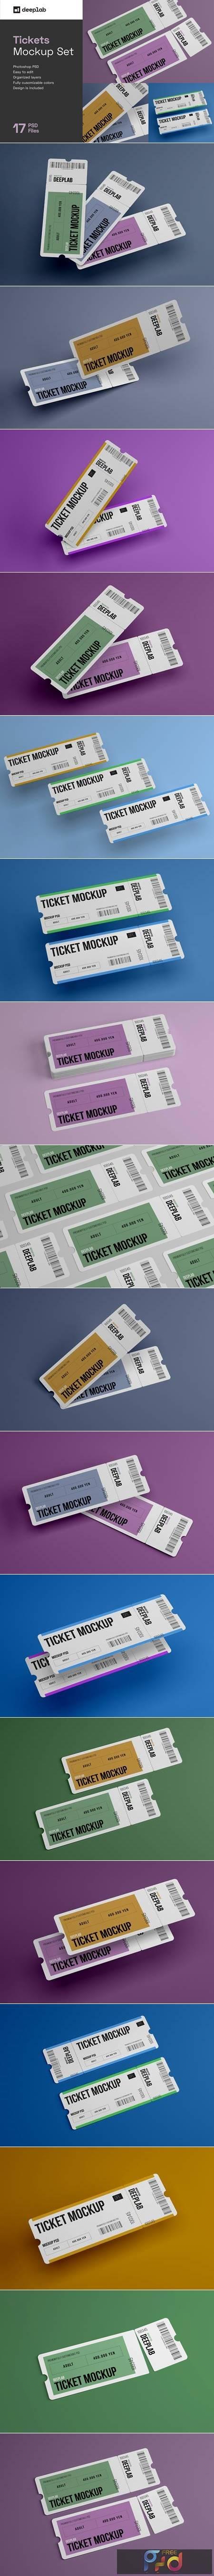 Tickets Mockup Set - 17 styles 4328495 1